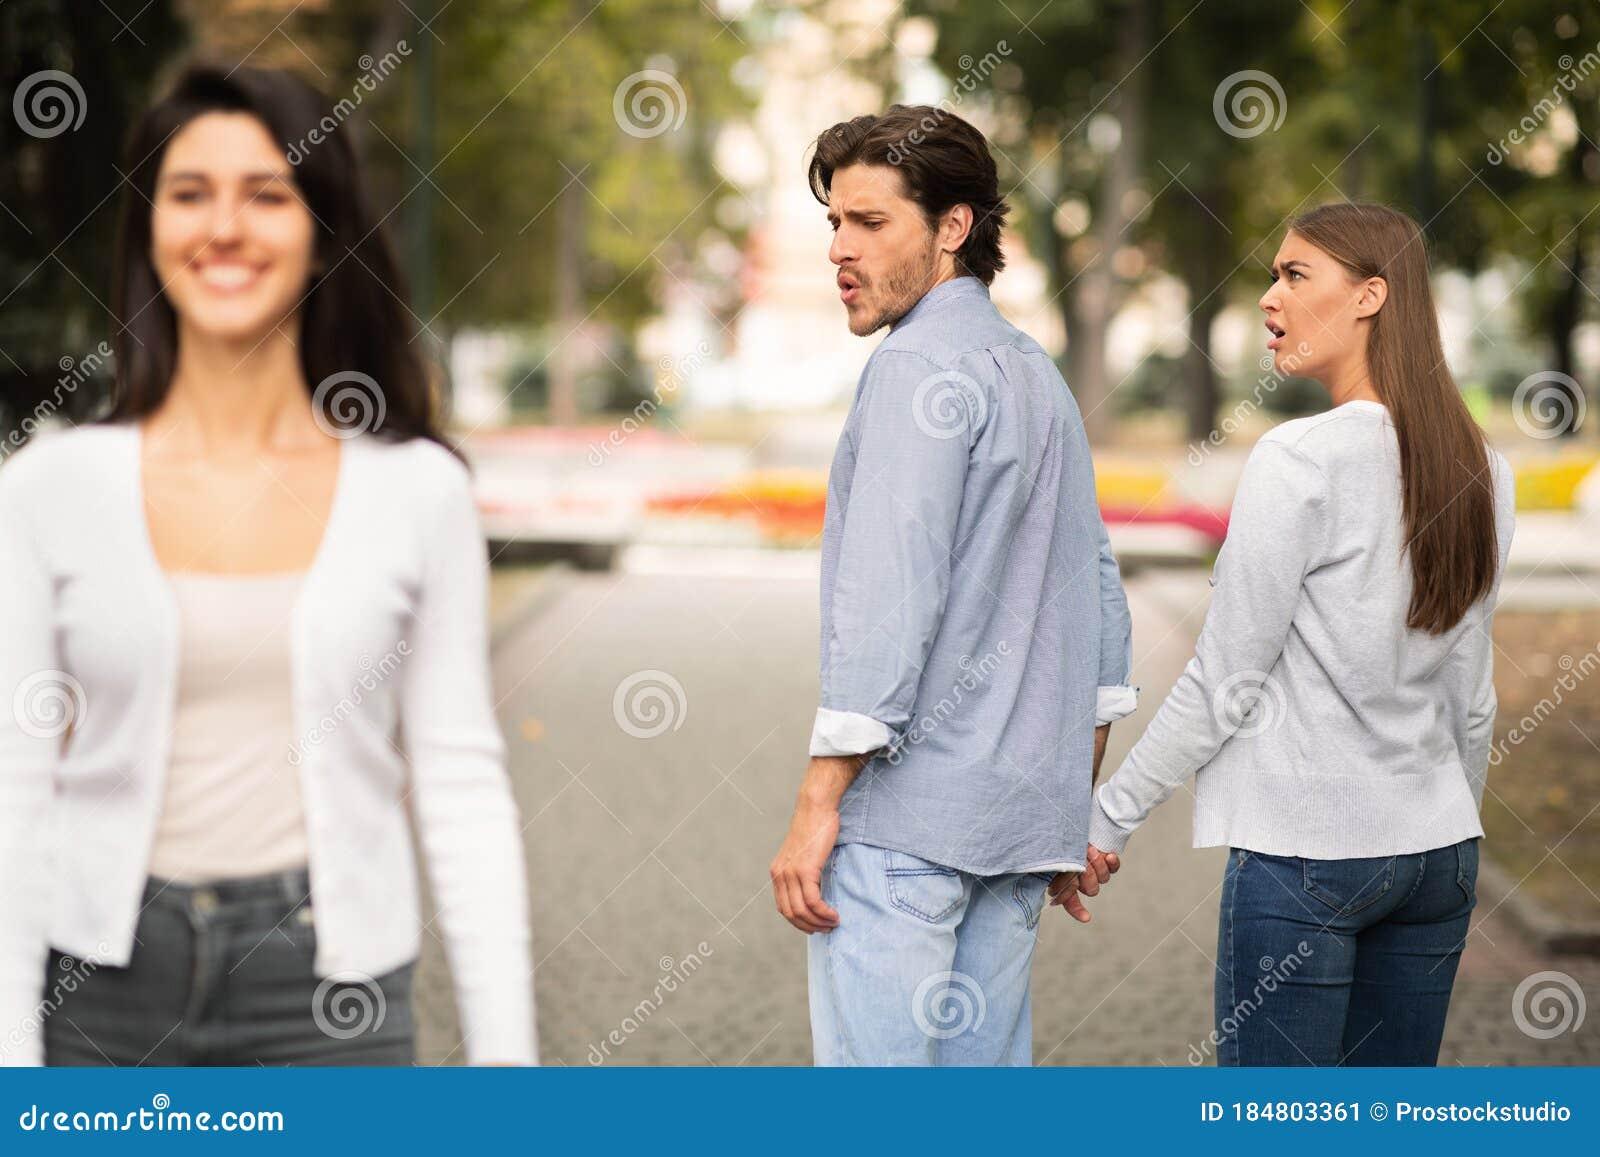 Looking boyfriend girl for Girl Posts